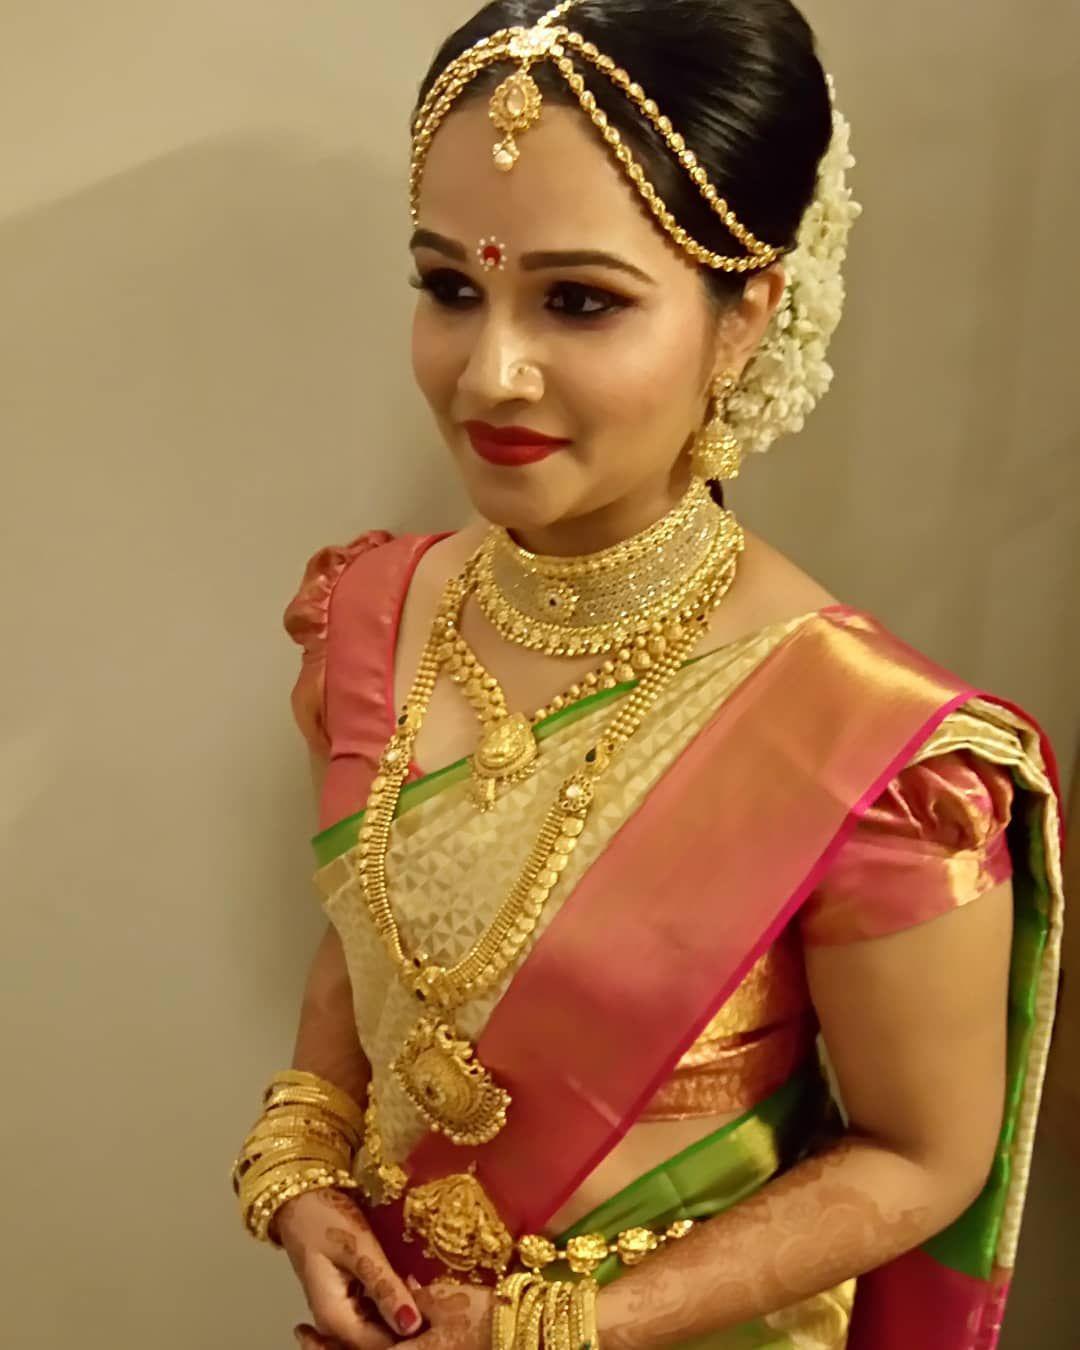 Hindu Wedding Makeup Work Indian Wear In 2019